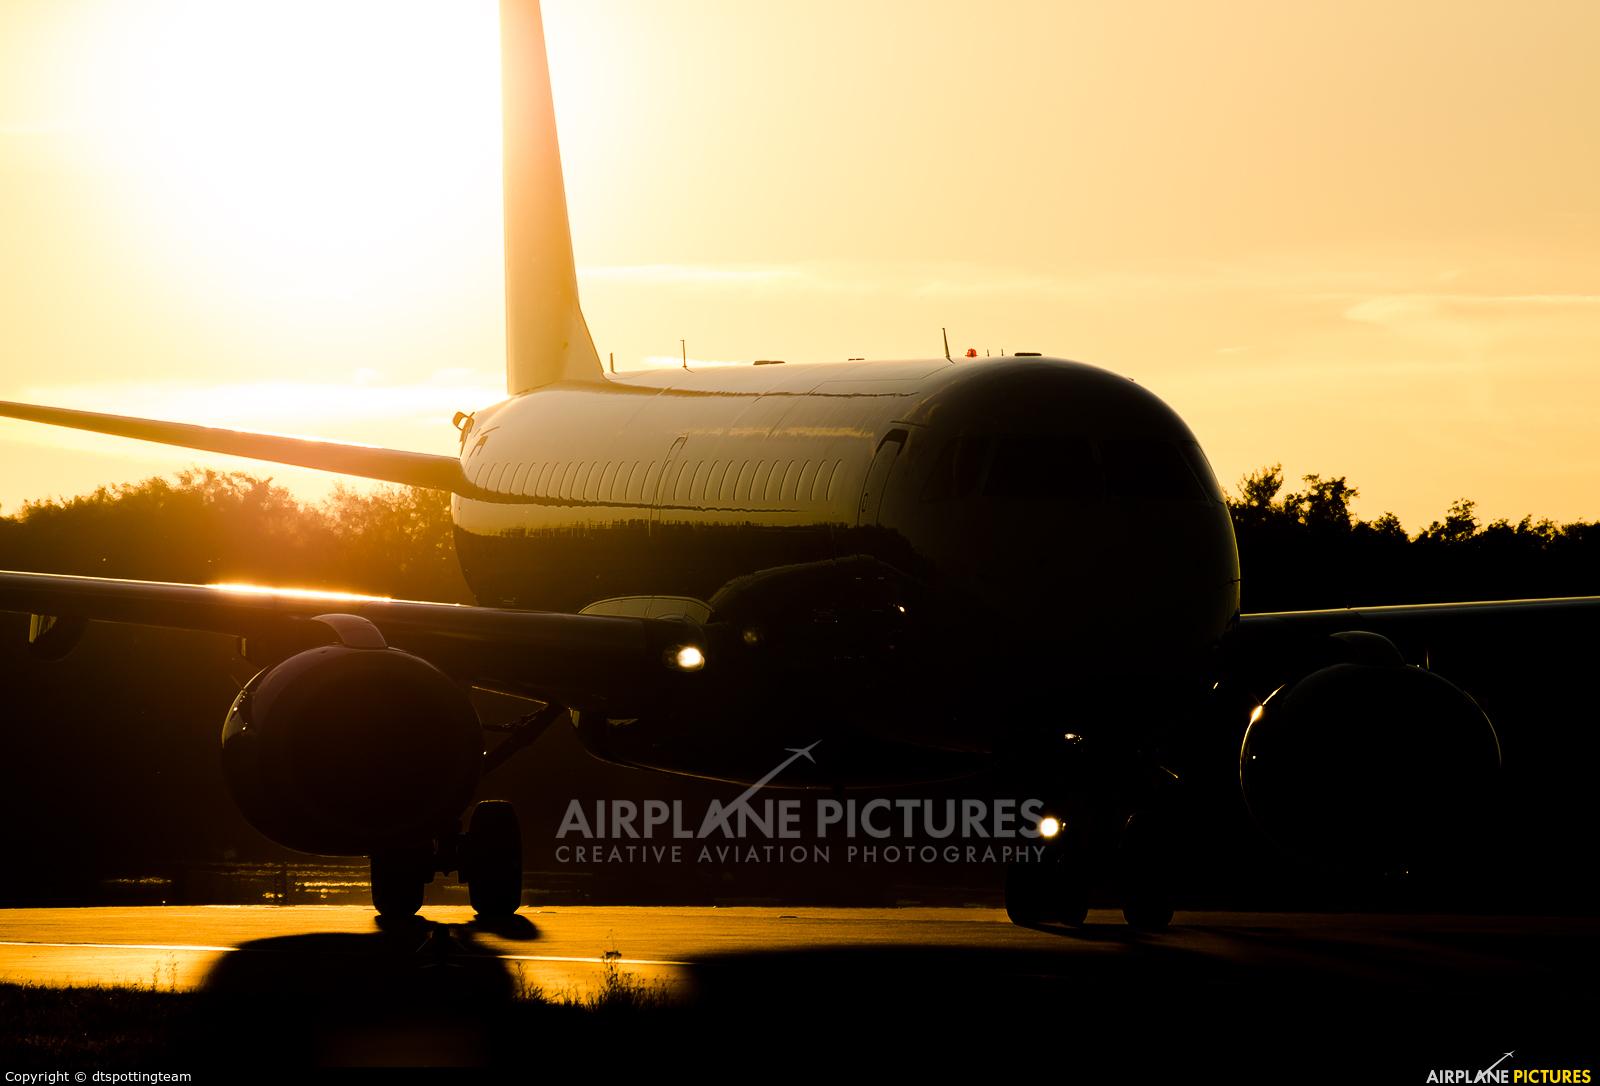 Lufthansa Regional - CityLine D-AECI aircraft at Frankfurt